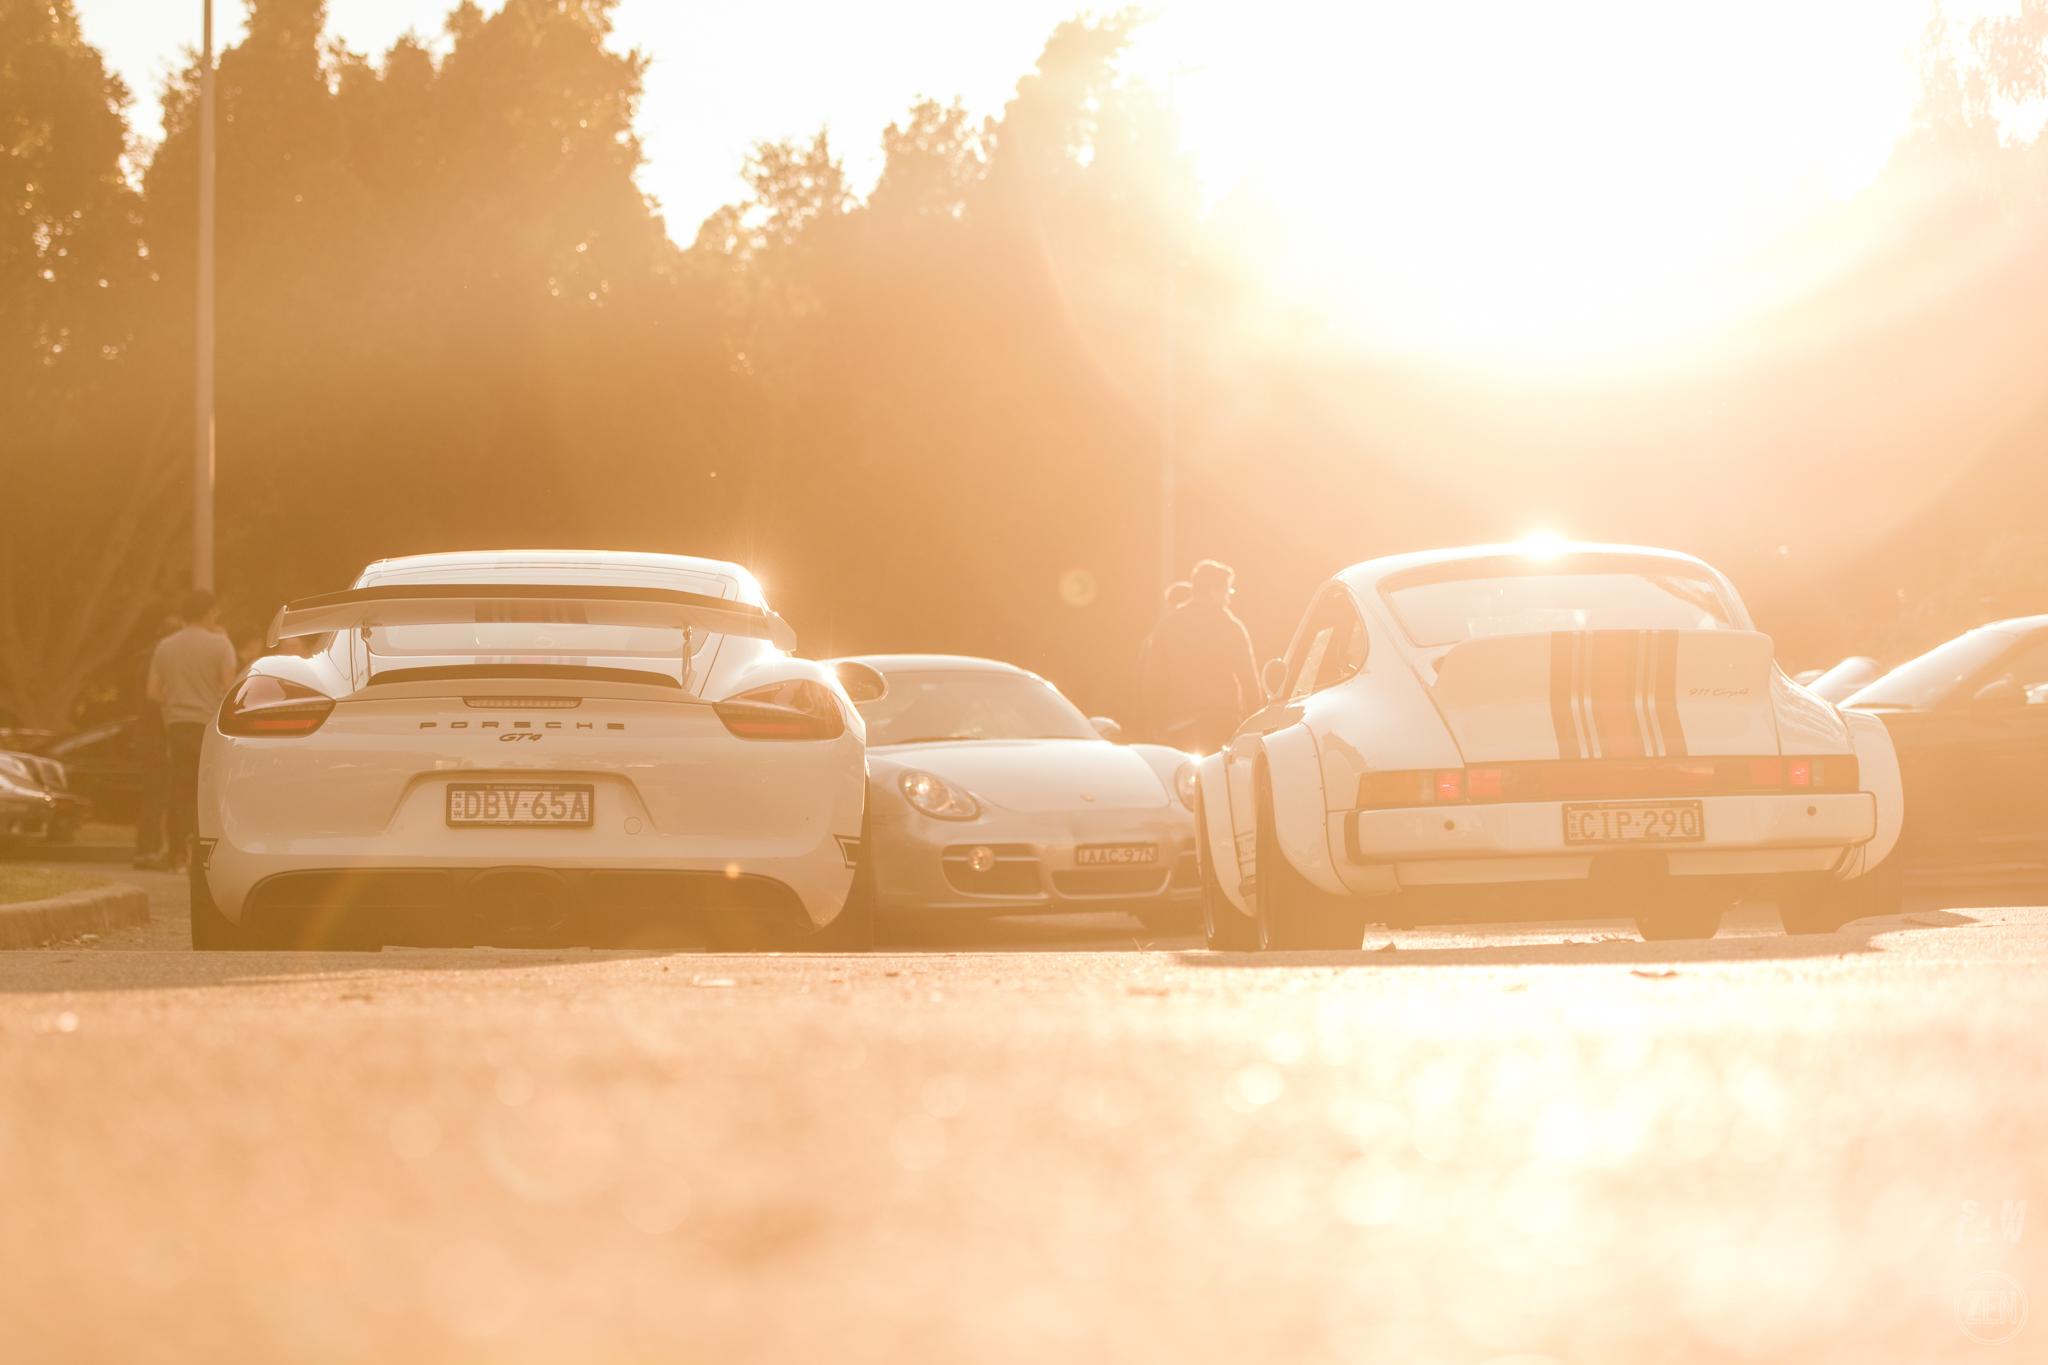 2019-10-27 - Autohaus Porsches & Coffee 035